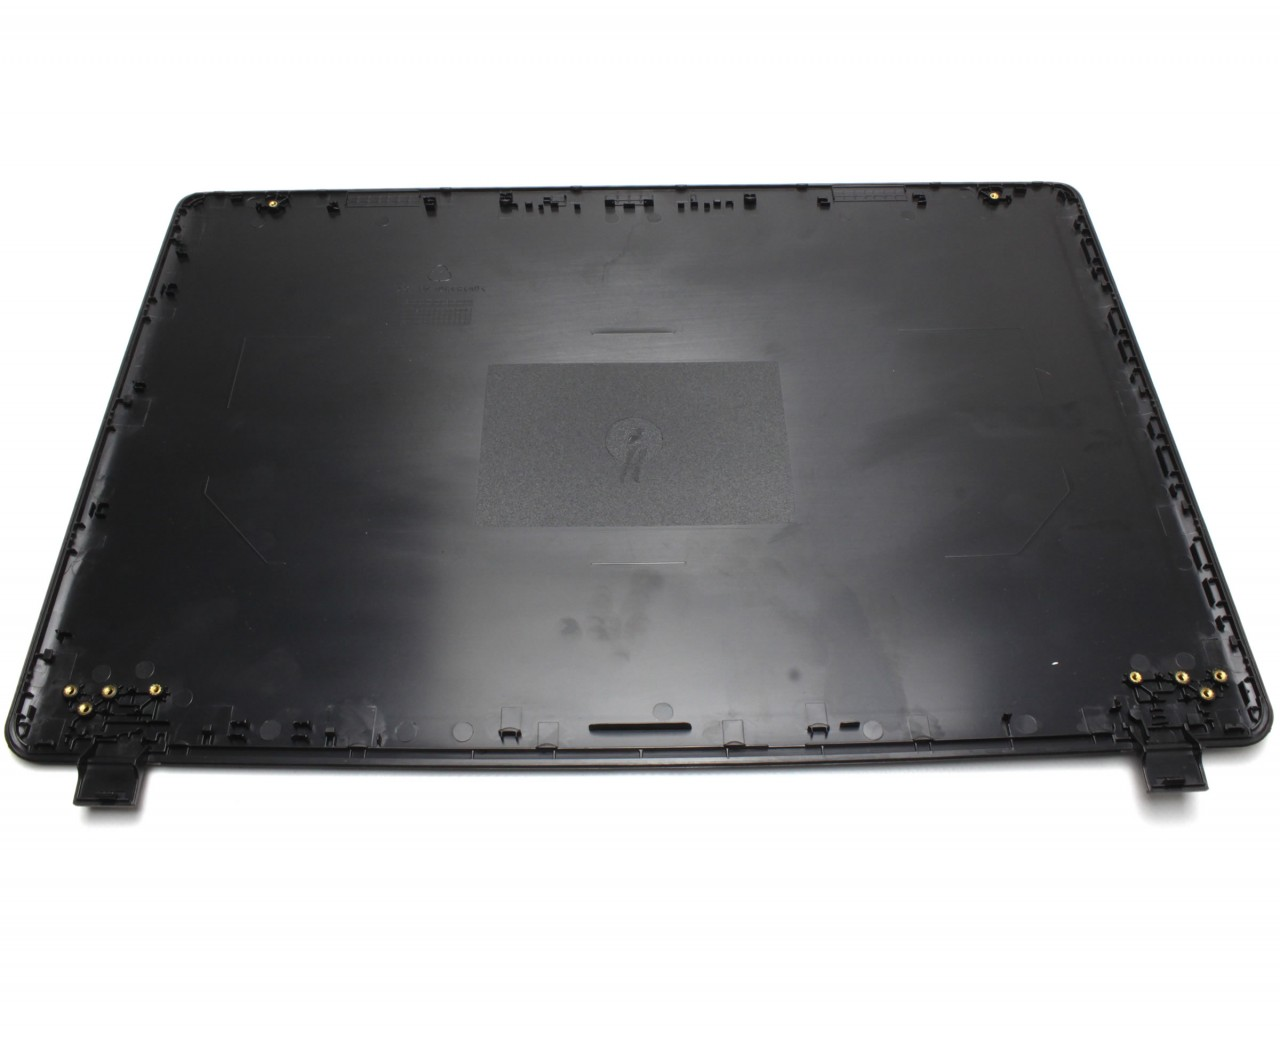 Capac Display BackCover Acer Aspire ES1-524 Carcasa Display imagine powerlaptop.ro 2021